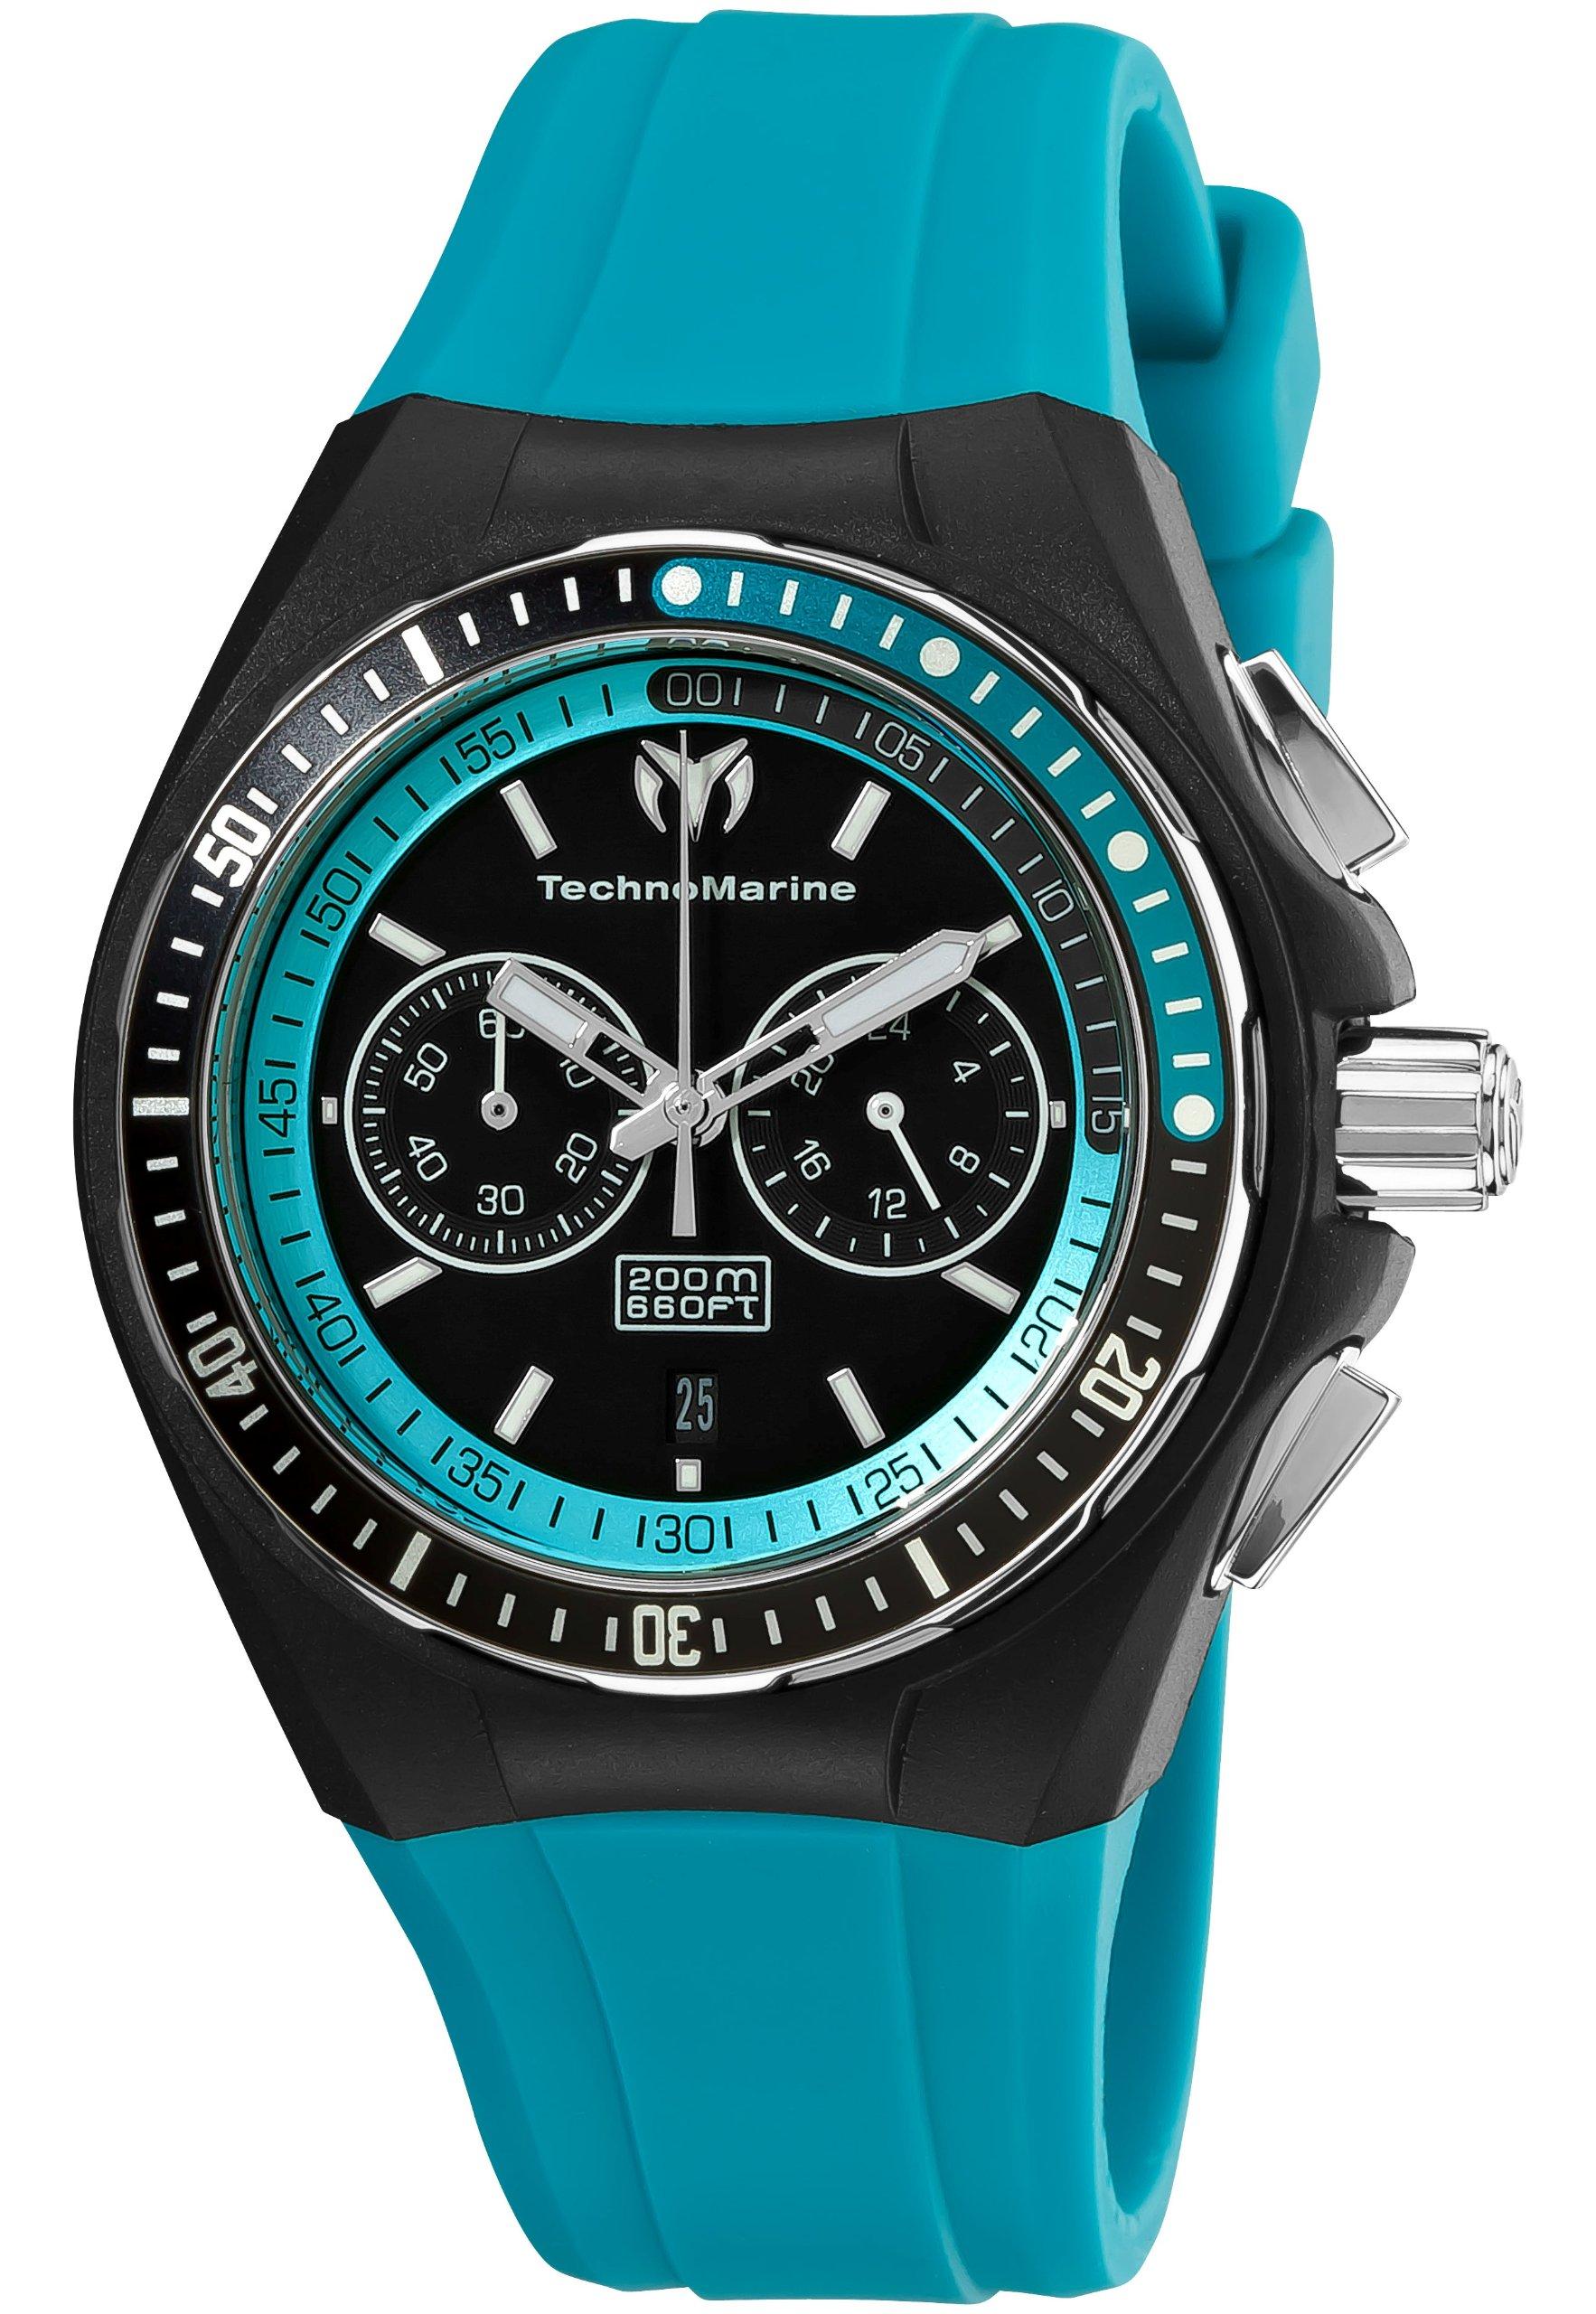 TechnoMarine Unisex 110017 Cruise Sport Chronograph Black & Blue Dial Watch